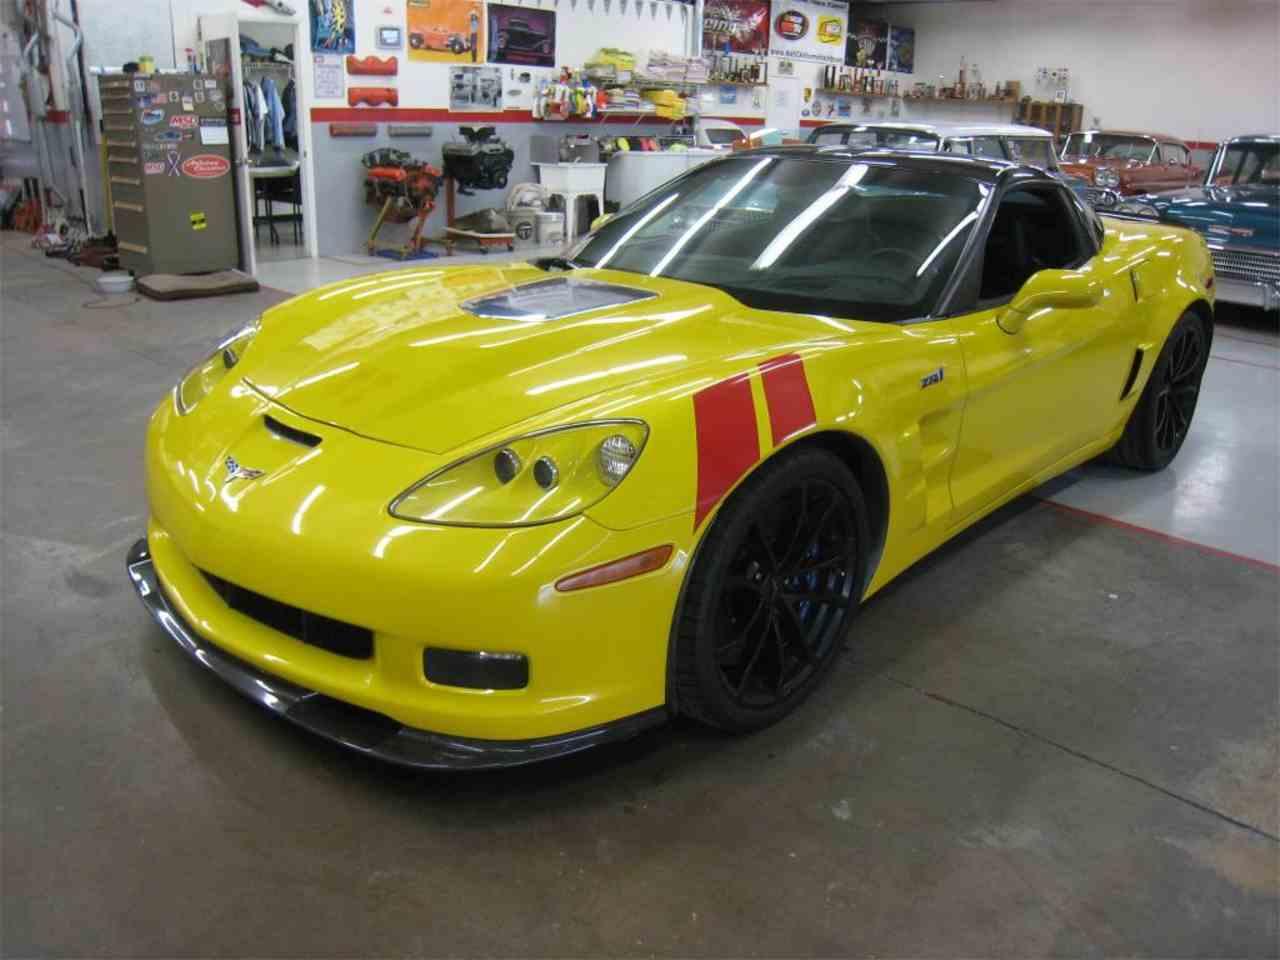 2013 Chevrolet Corvette for Sale - CC-1003060